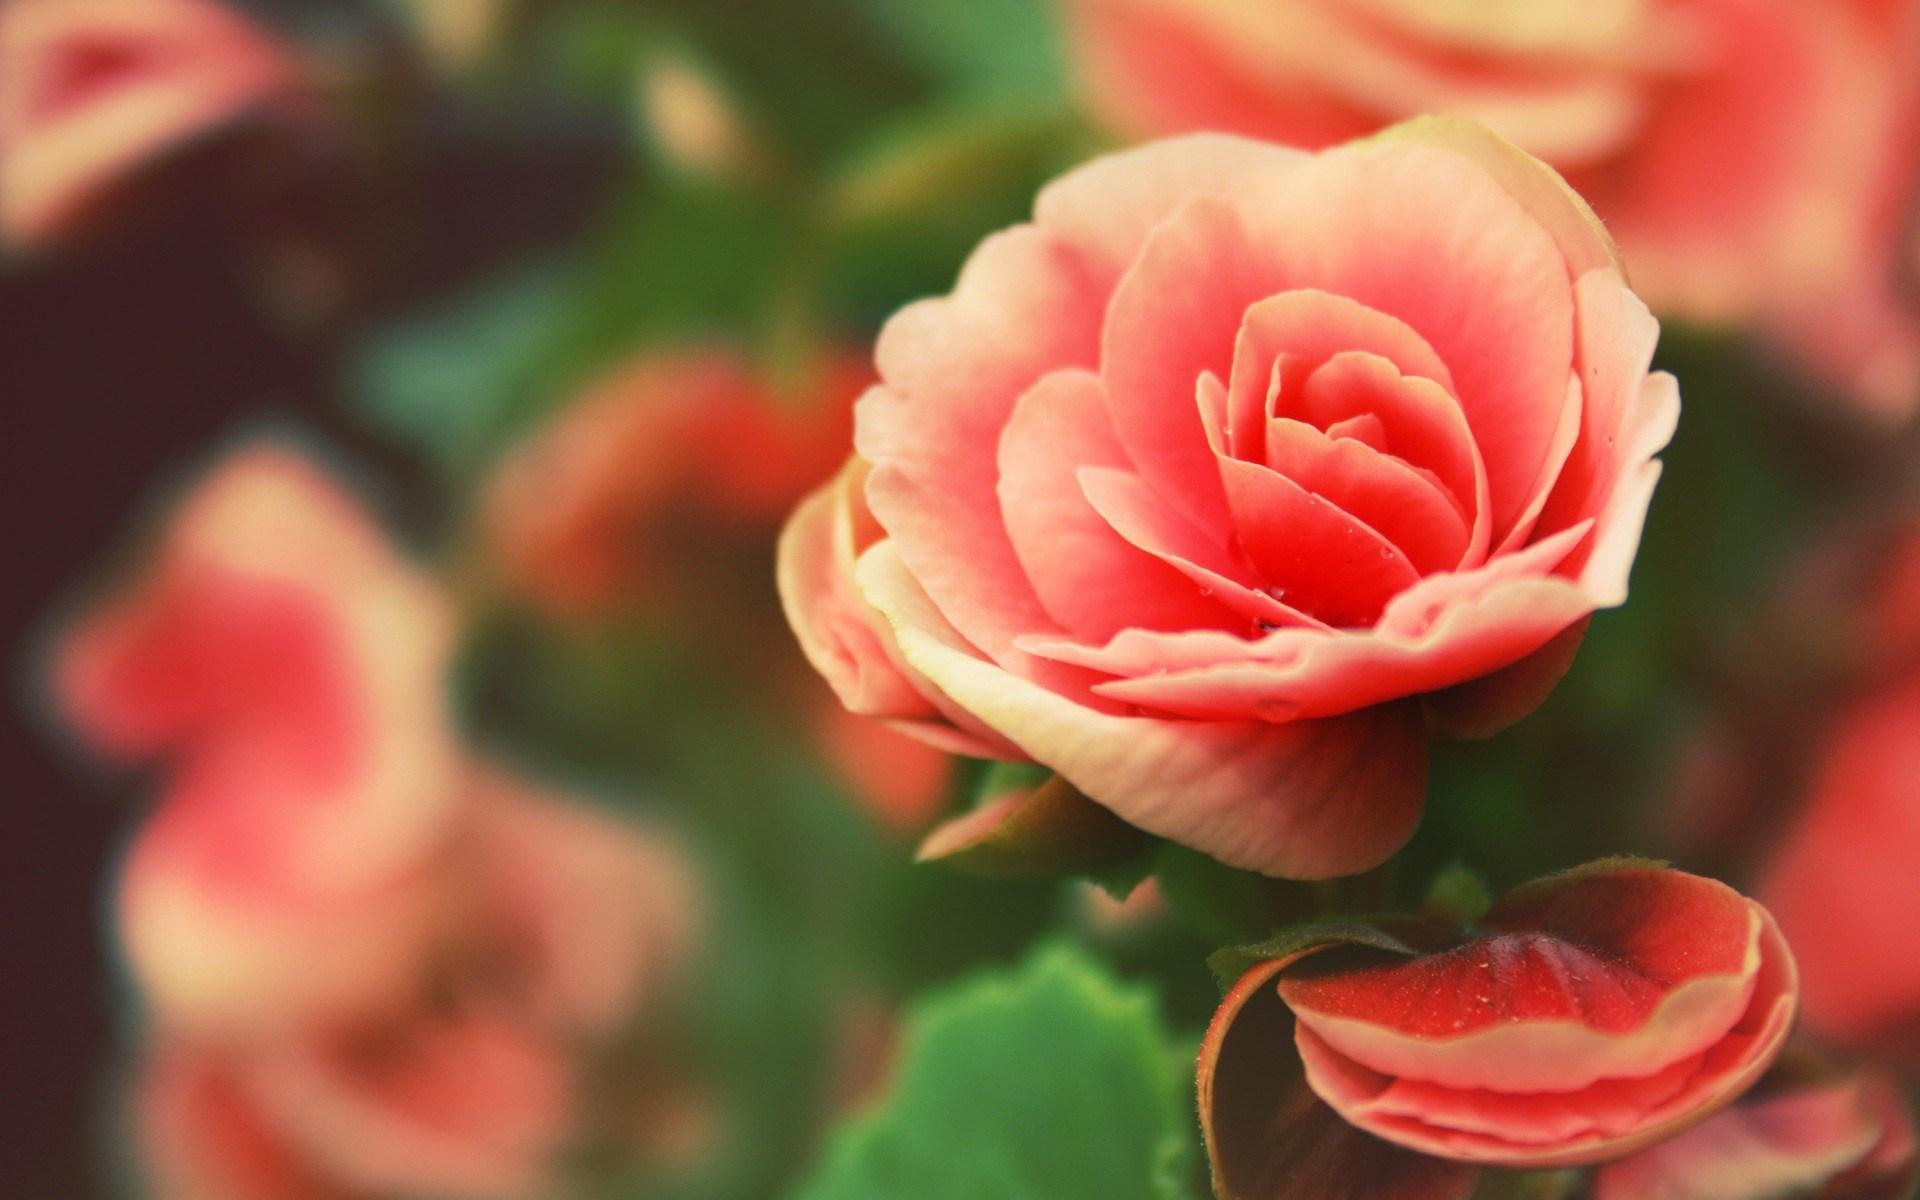 Beautiful Roses Flowers Nature Close-Up Photo